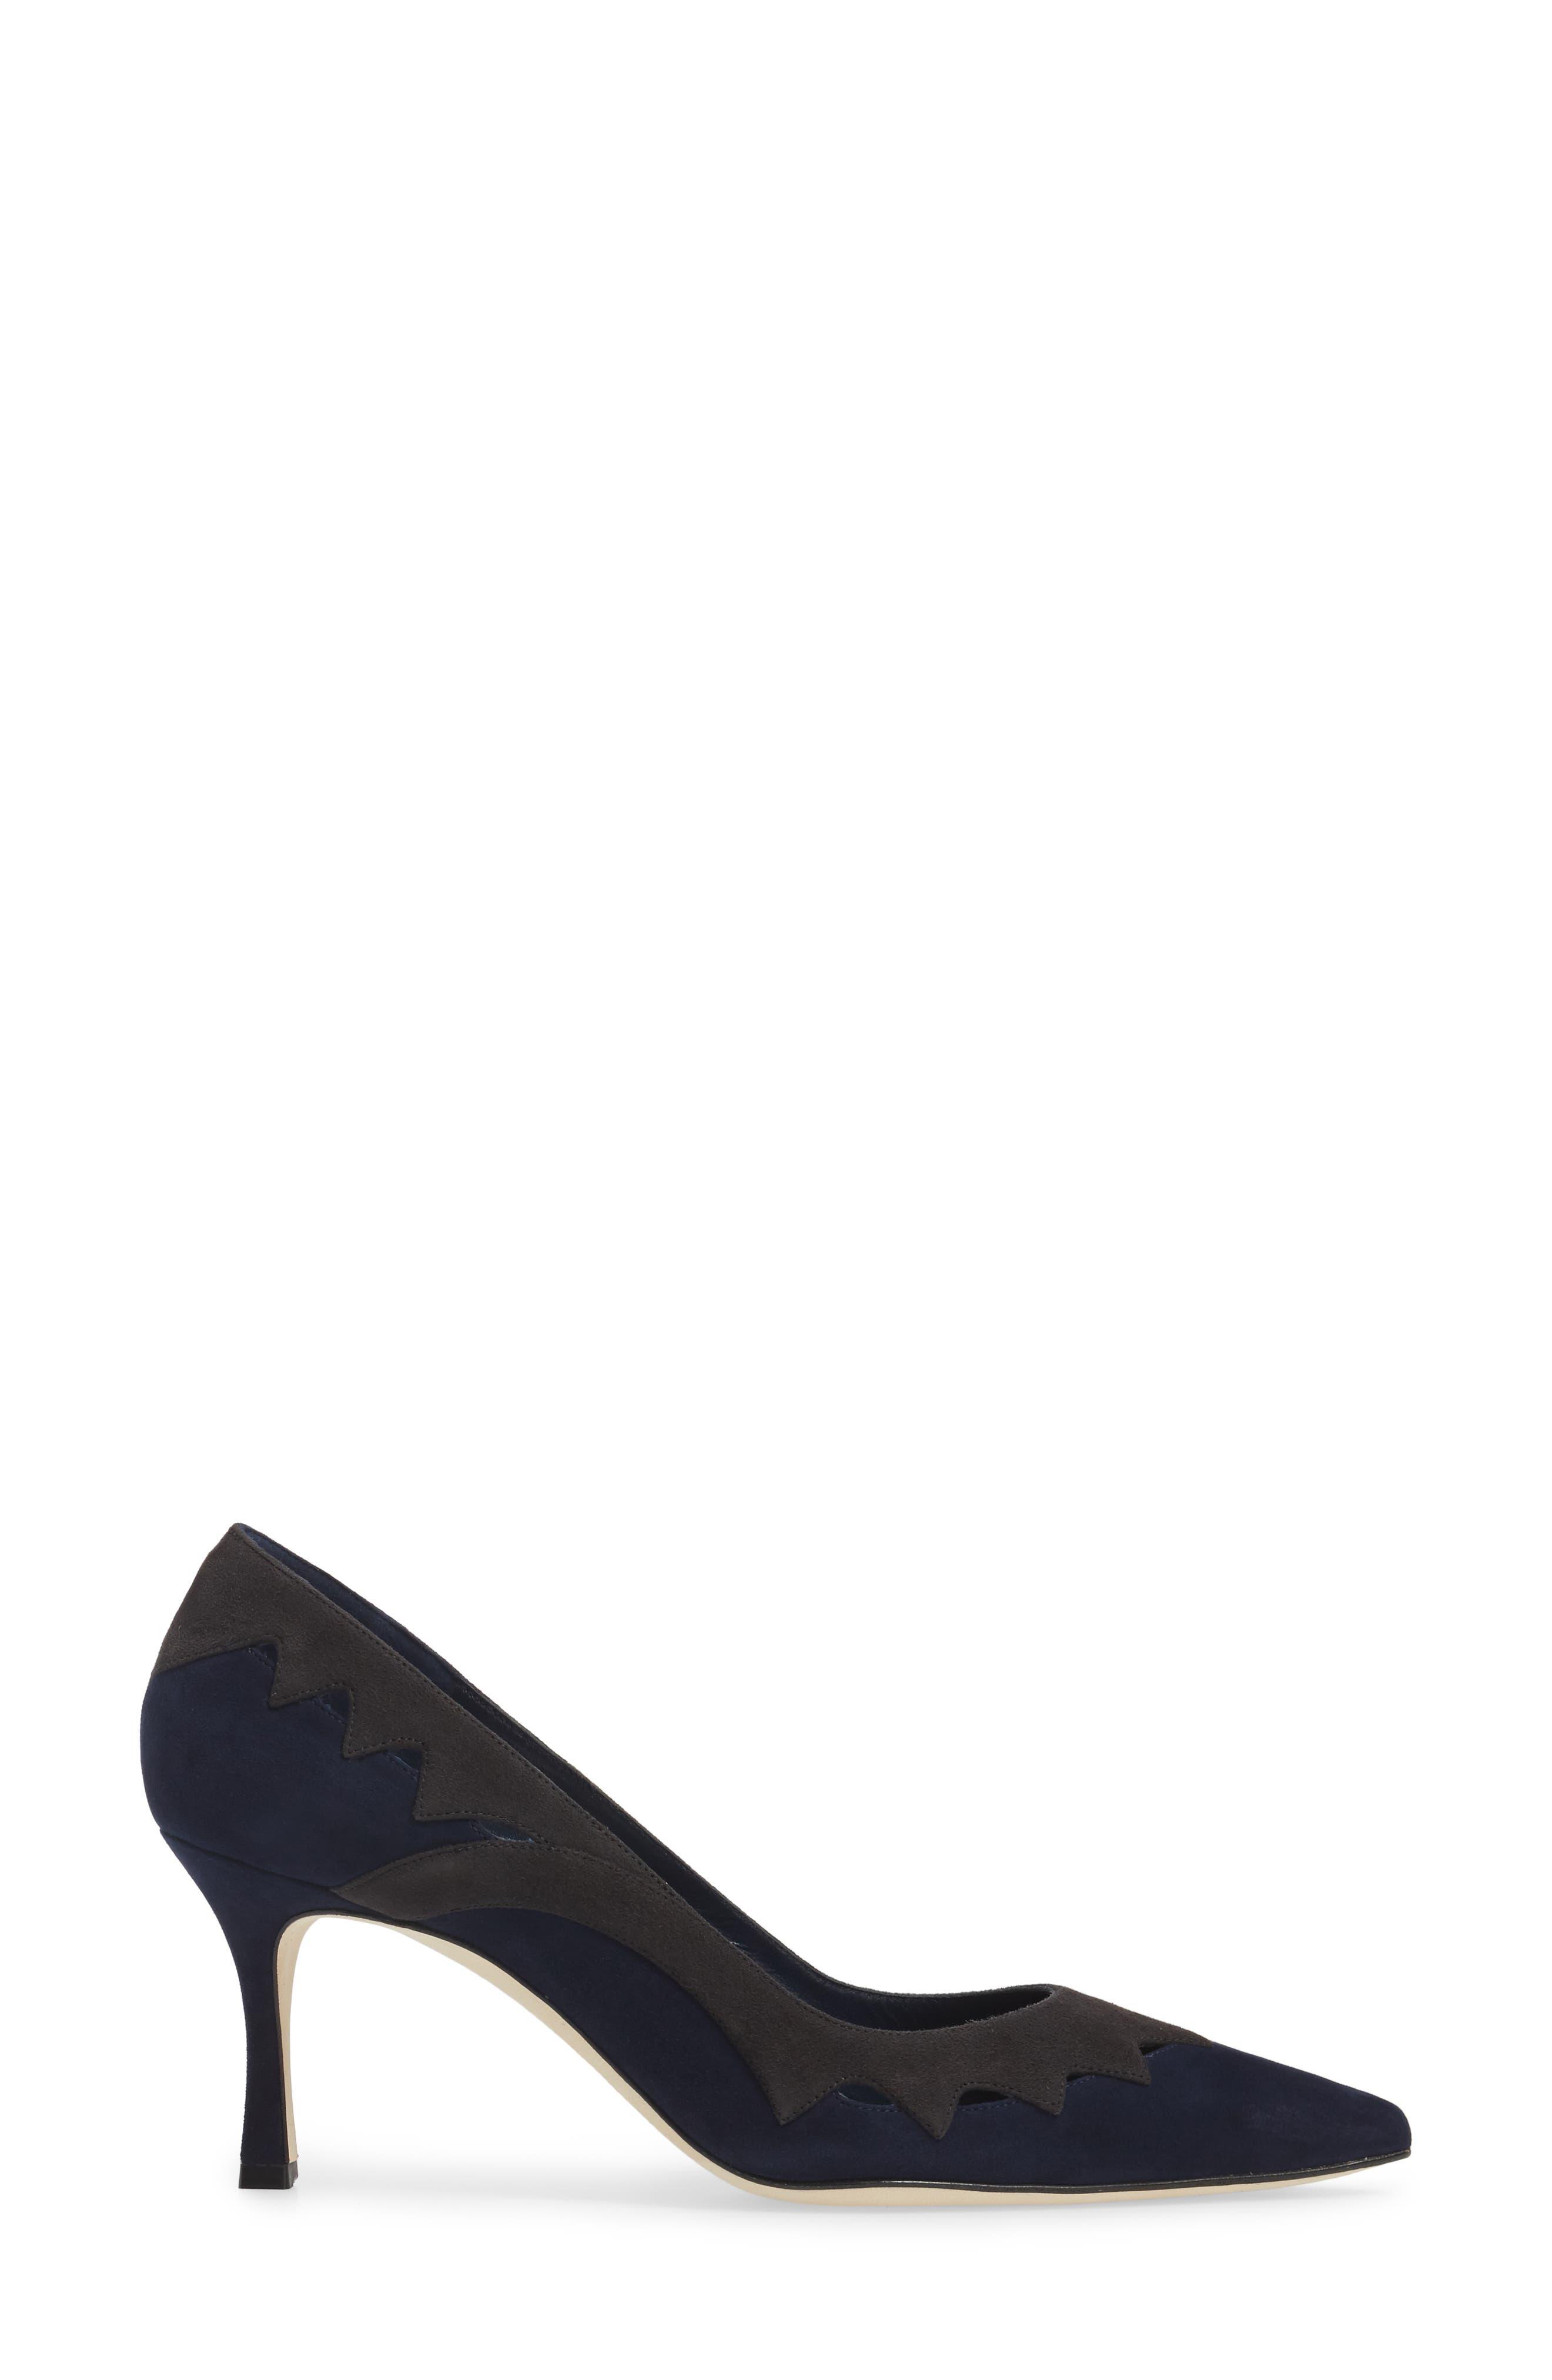 Alternate Image 3  - Manolo Blahnik Valero Pointy Toe Pump (Women)